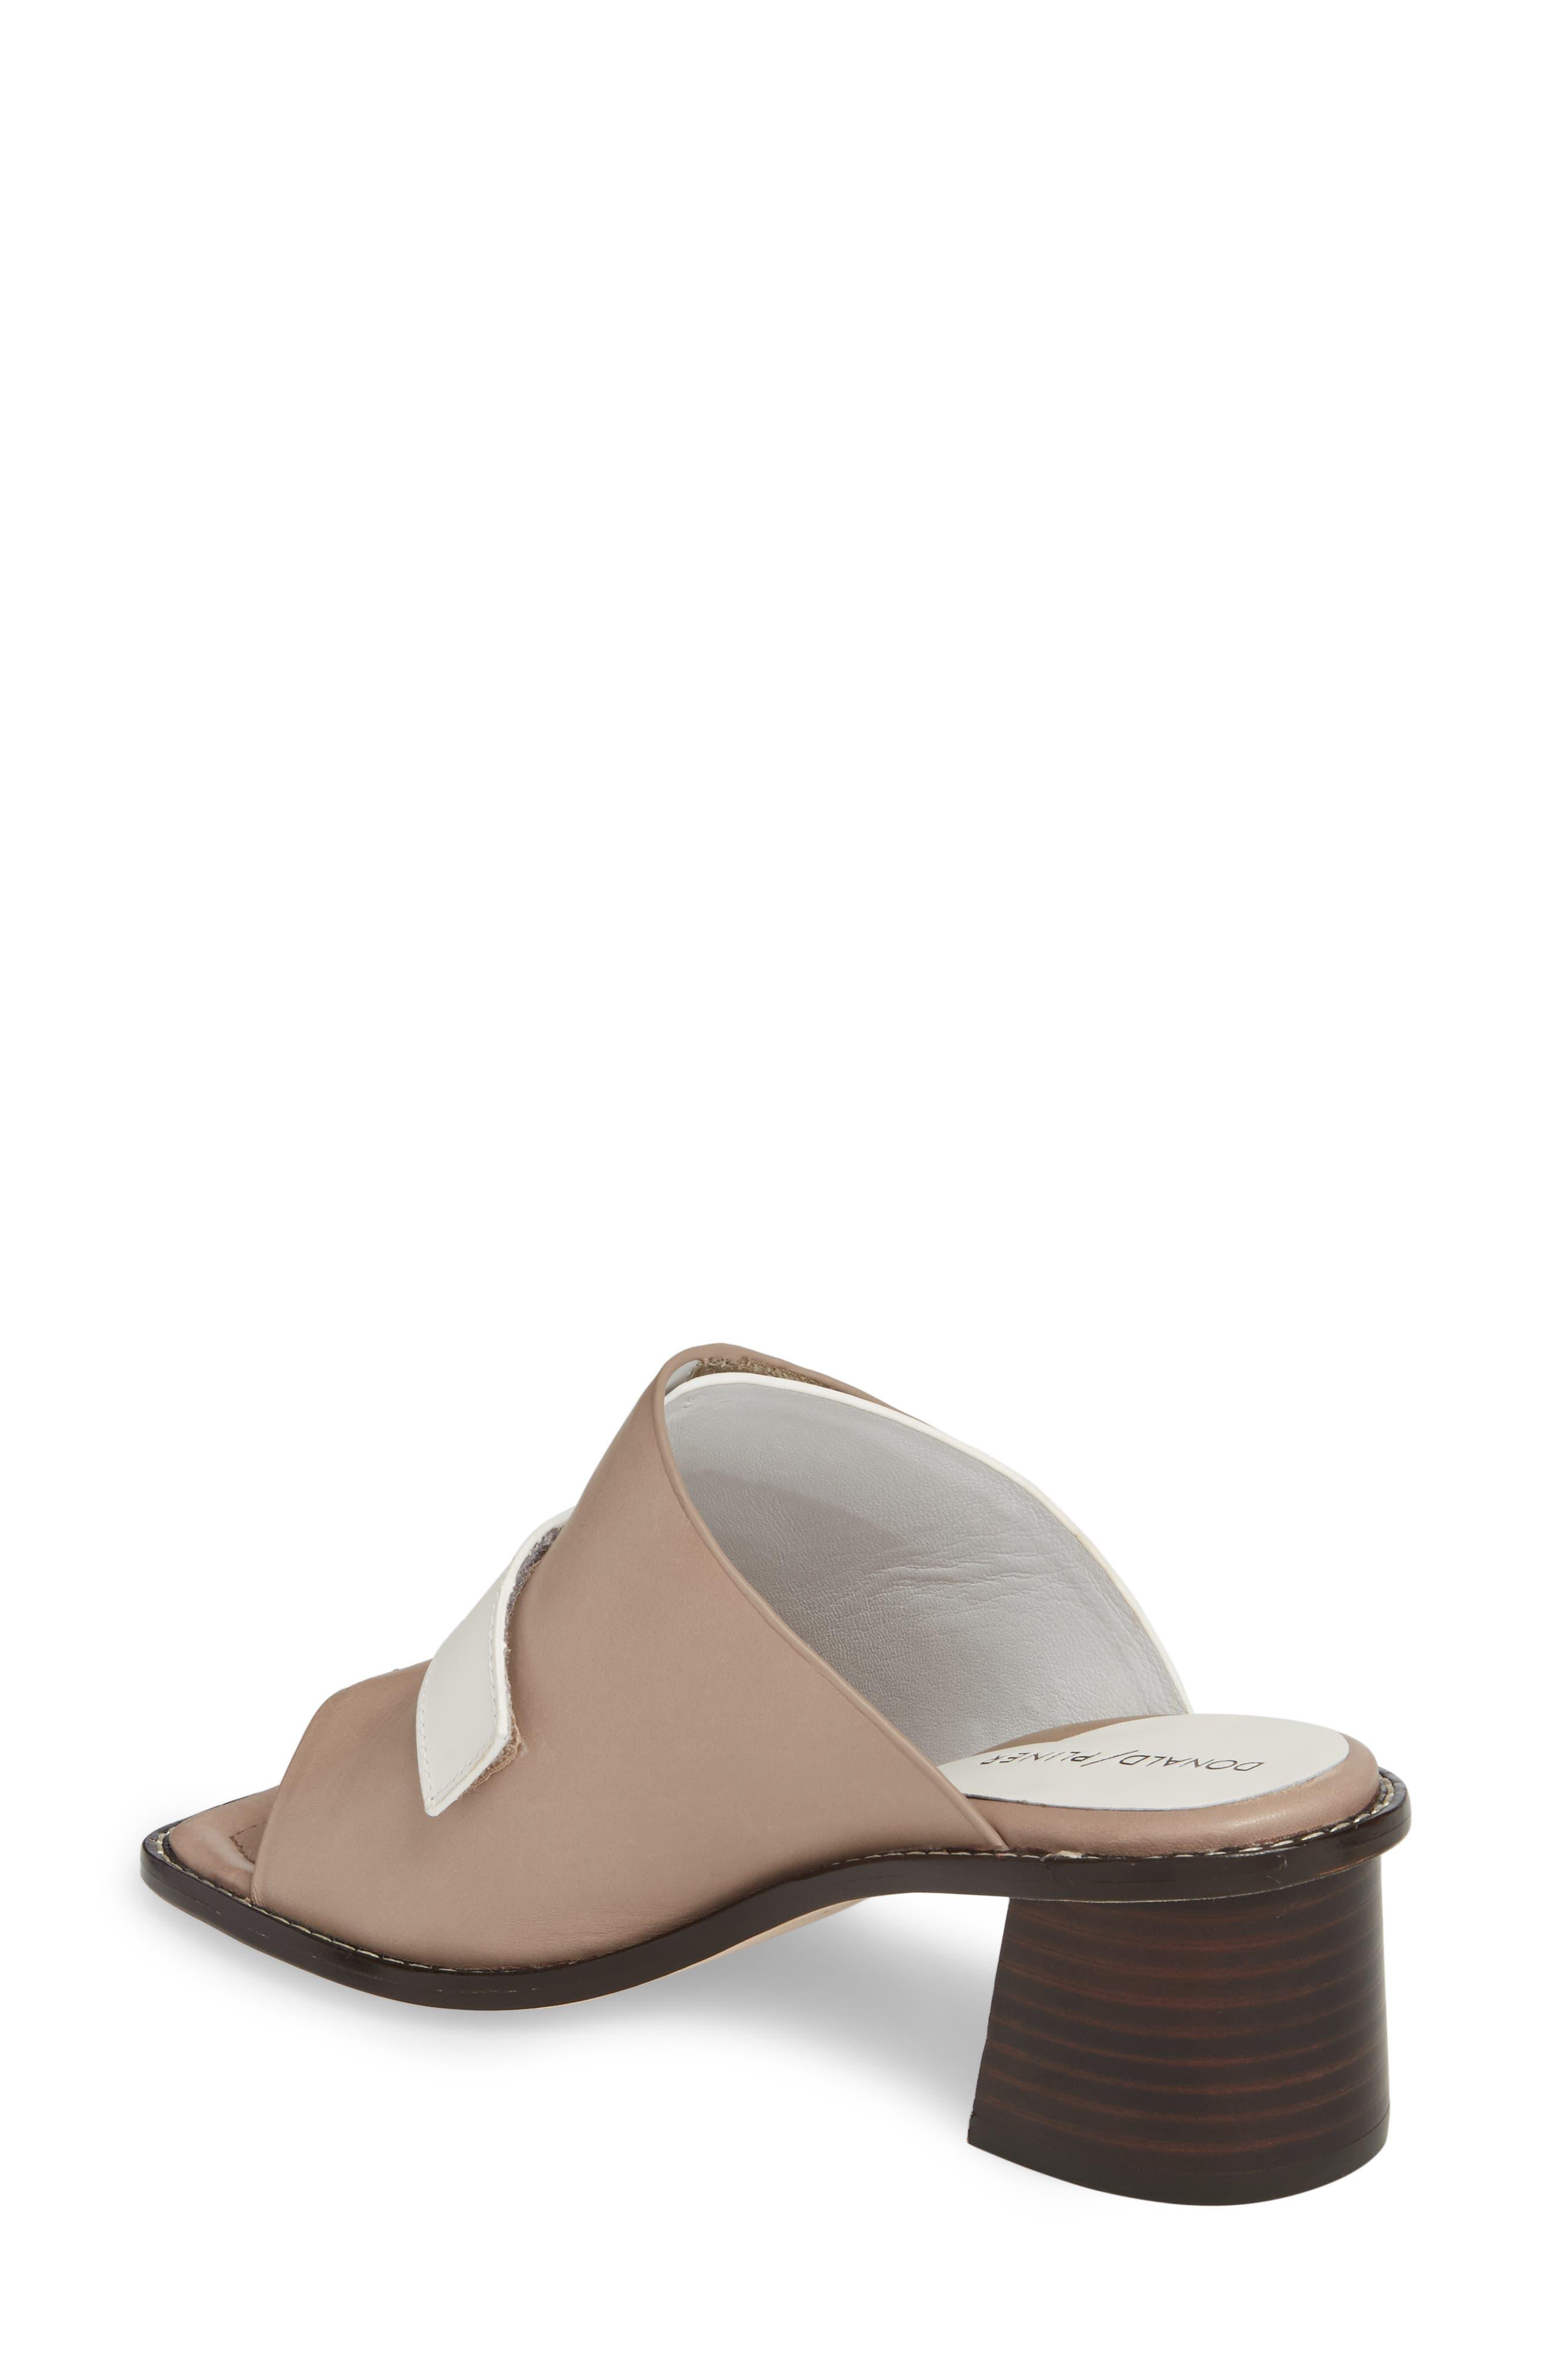 Amalia Block Heel Sandal,                             Alternate thumbnail 2, color,                             Bone Leather